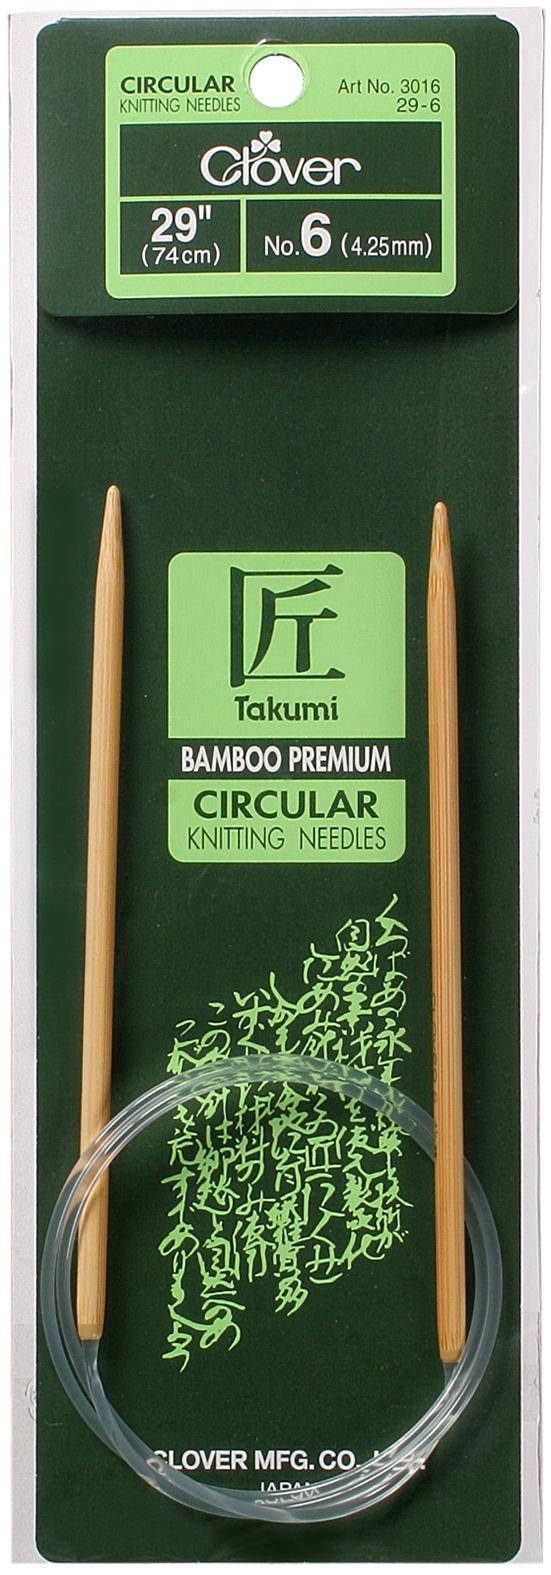 Takumi Bamboo Circular Knitting Needles 29-Size 6/4mm